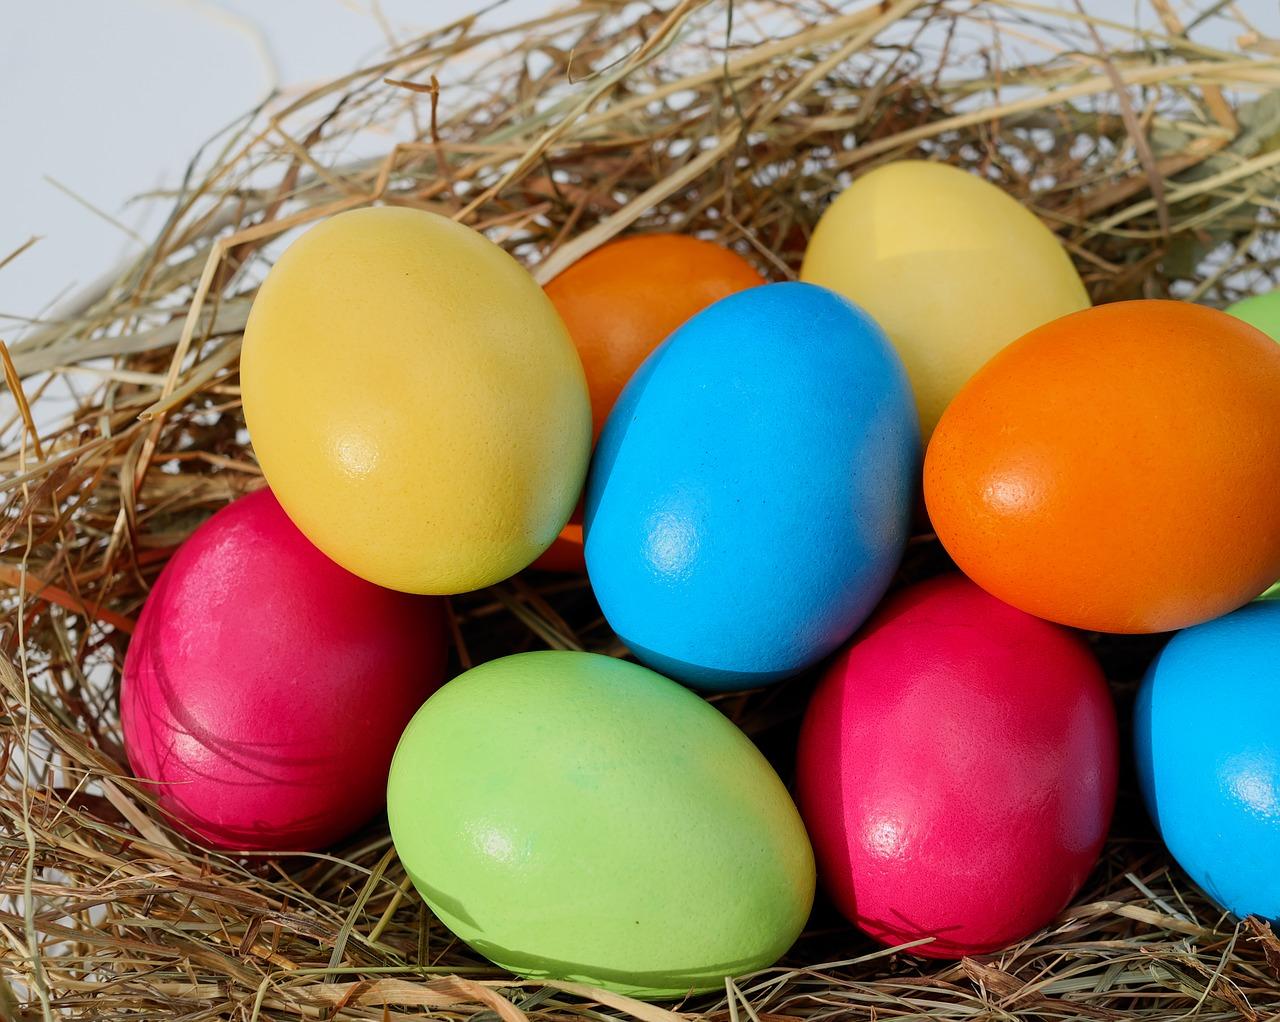 Mount Edgcumbe Easter Egg Hunt 2020